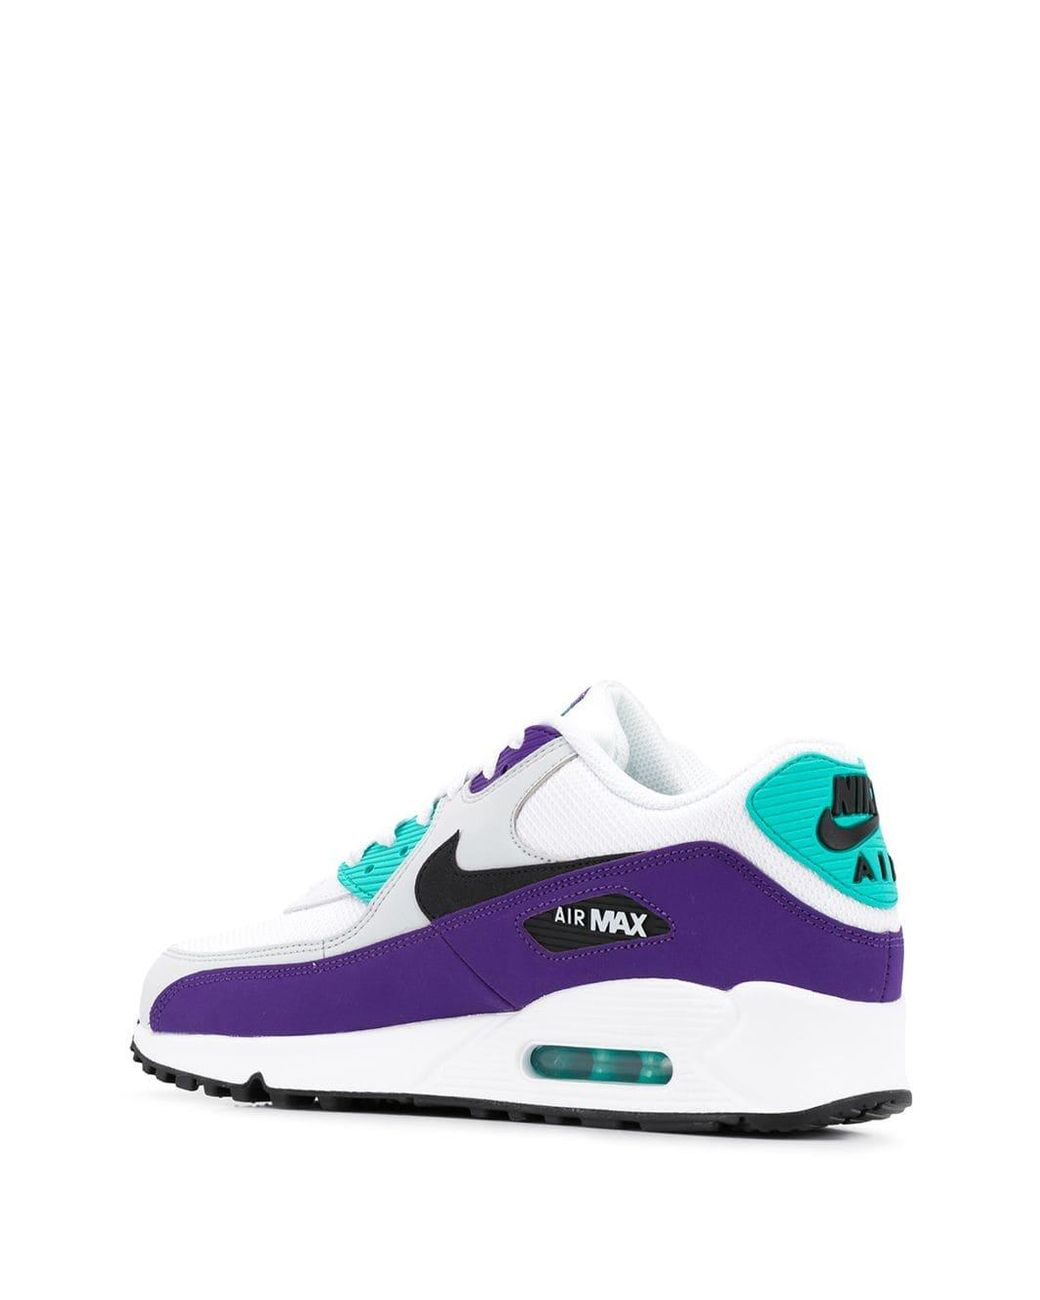 wholesale dealer 00ca3 988b4 Nike Air Max 90 Essential White  Black-hyper Jade-court Purple in White for  Men - Save 50% - Lyst